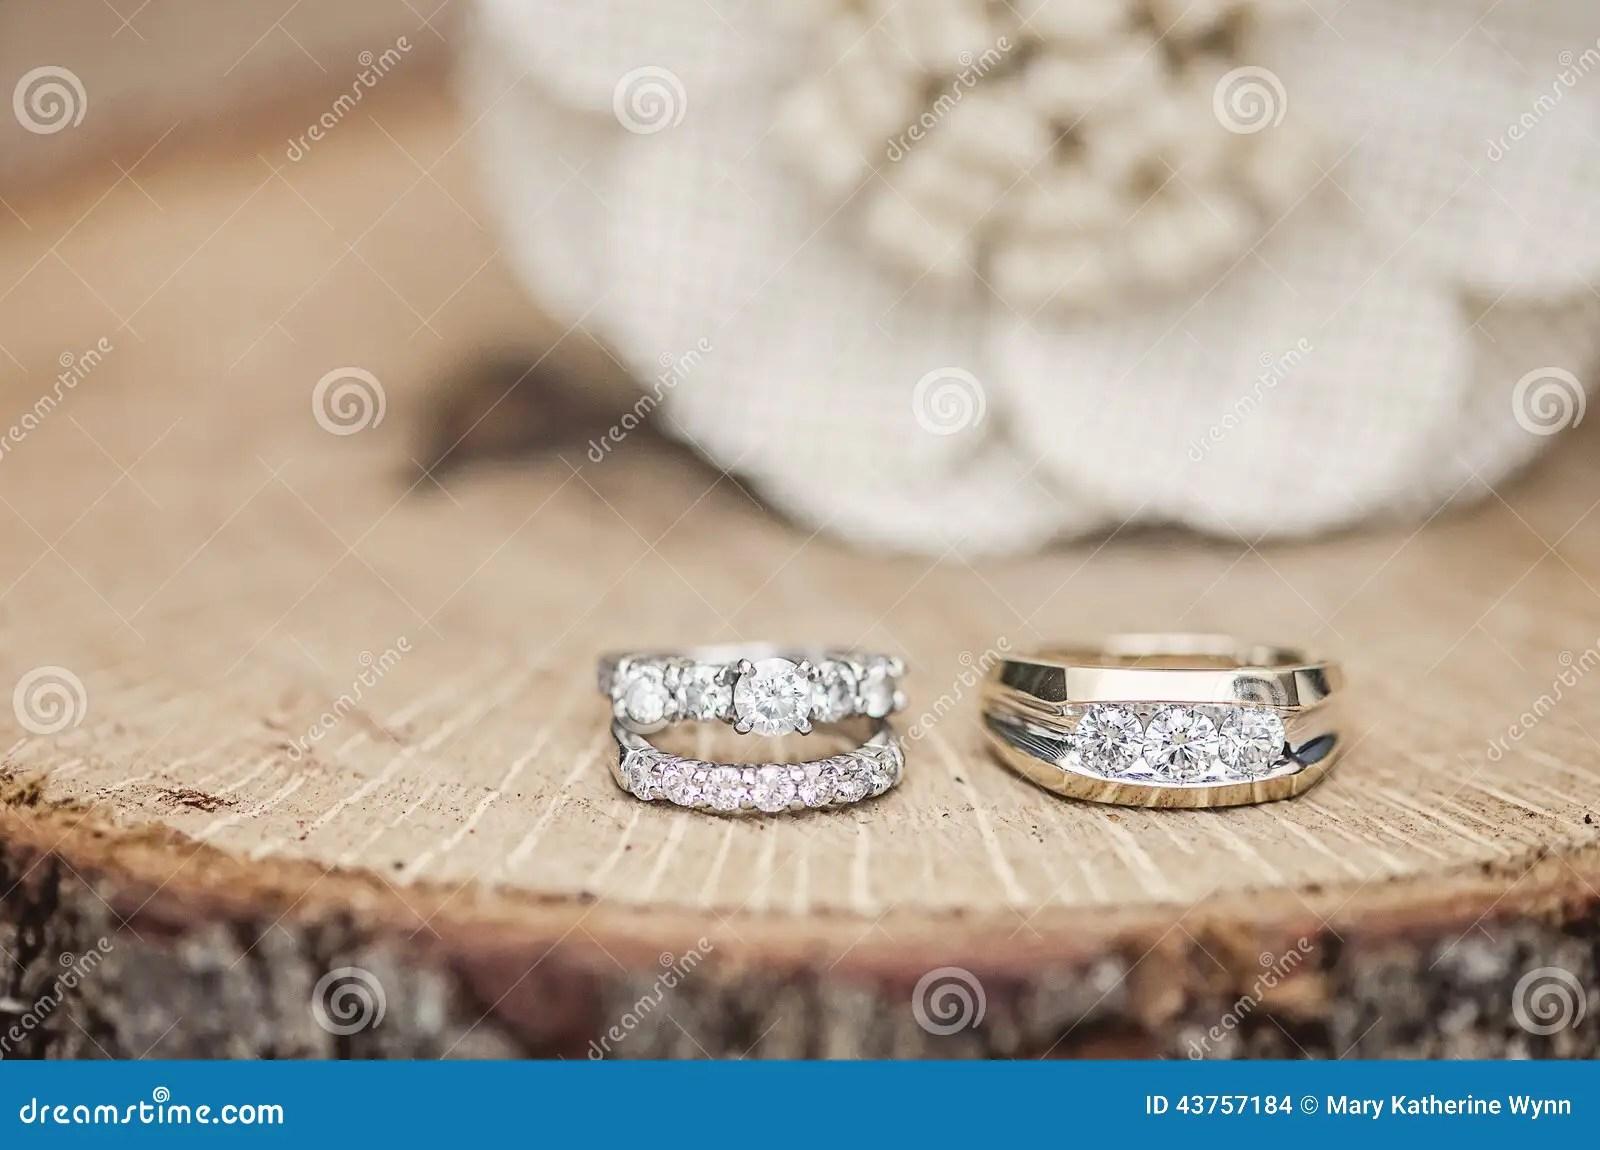 Wedding Rings Rustic Setting Stock Photo Image 43757184